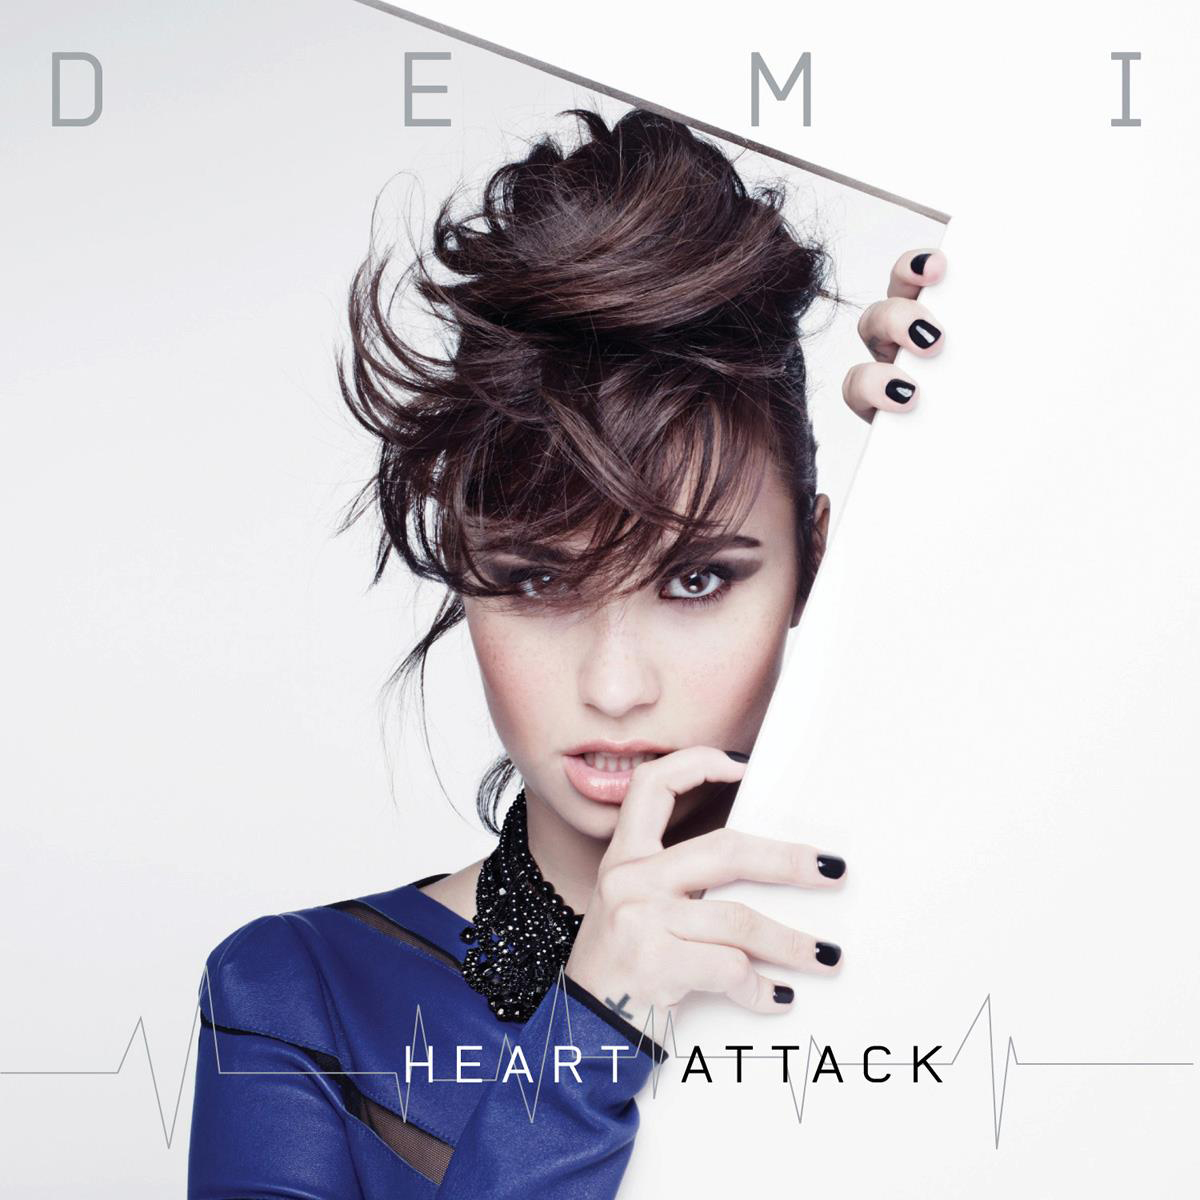 http://2.bp.blogspot.com/-m05-2xA3B14/URqDjLe1aiI/AAAAAAAASOI/nnE_WqulwPU/s1600/Demi-Lovato-Heart-Attack-official-single-artwork-march-4-2013.jpg